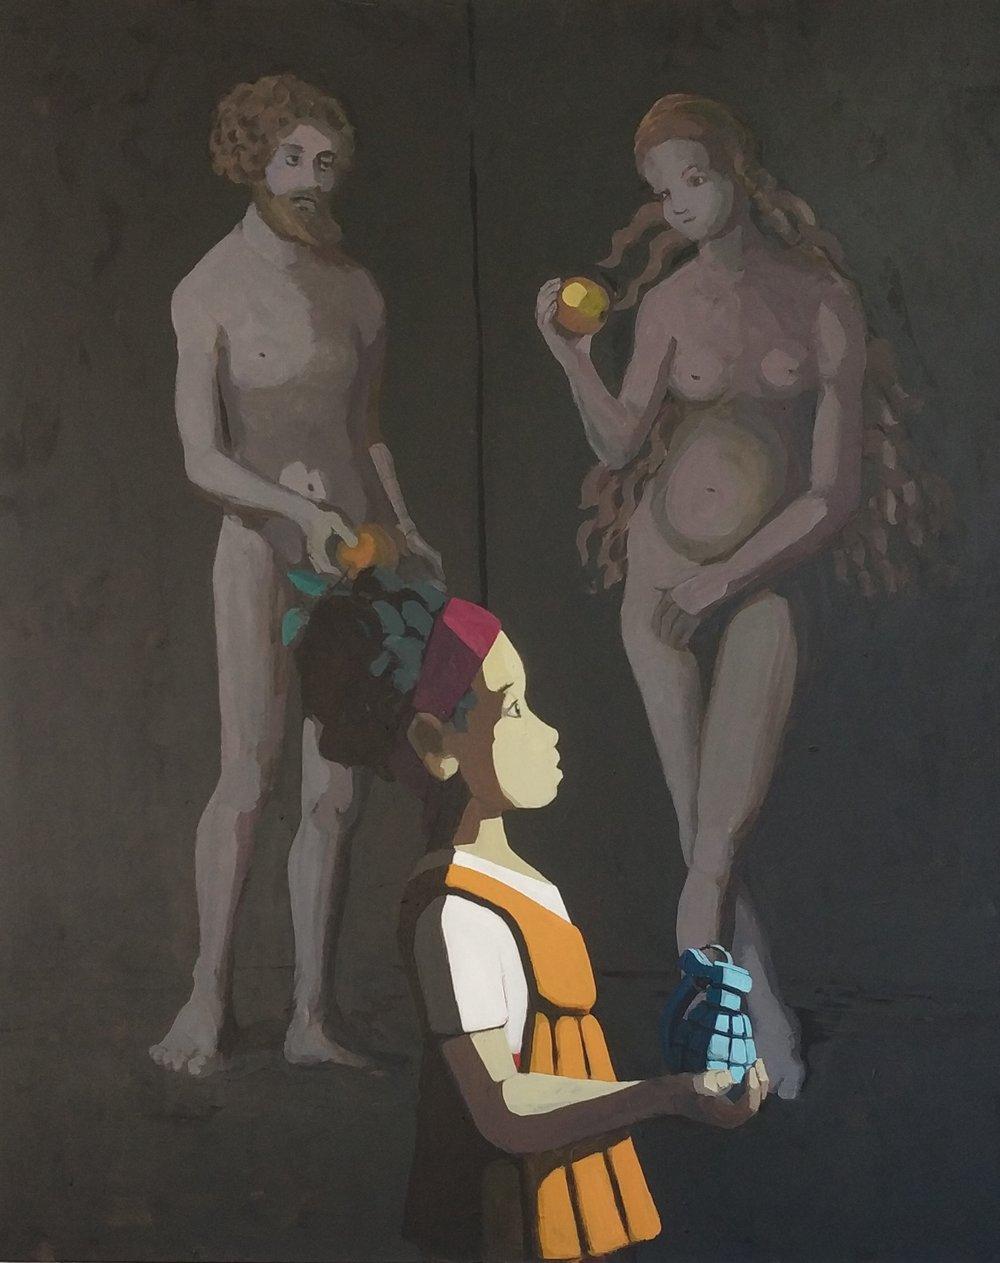 Acryl auf Leinwand 145 cm x 120 cm, 2018